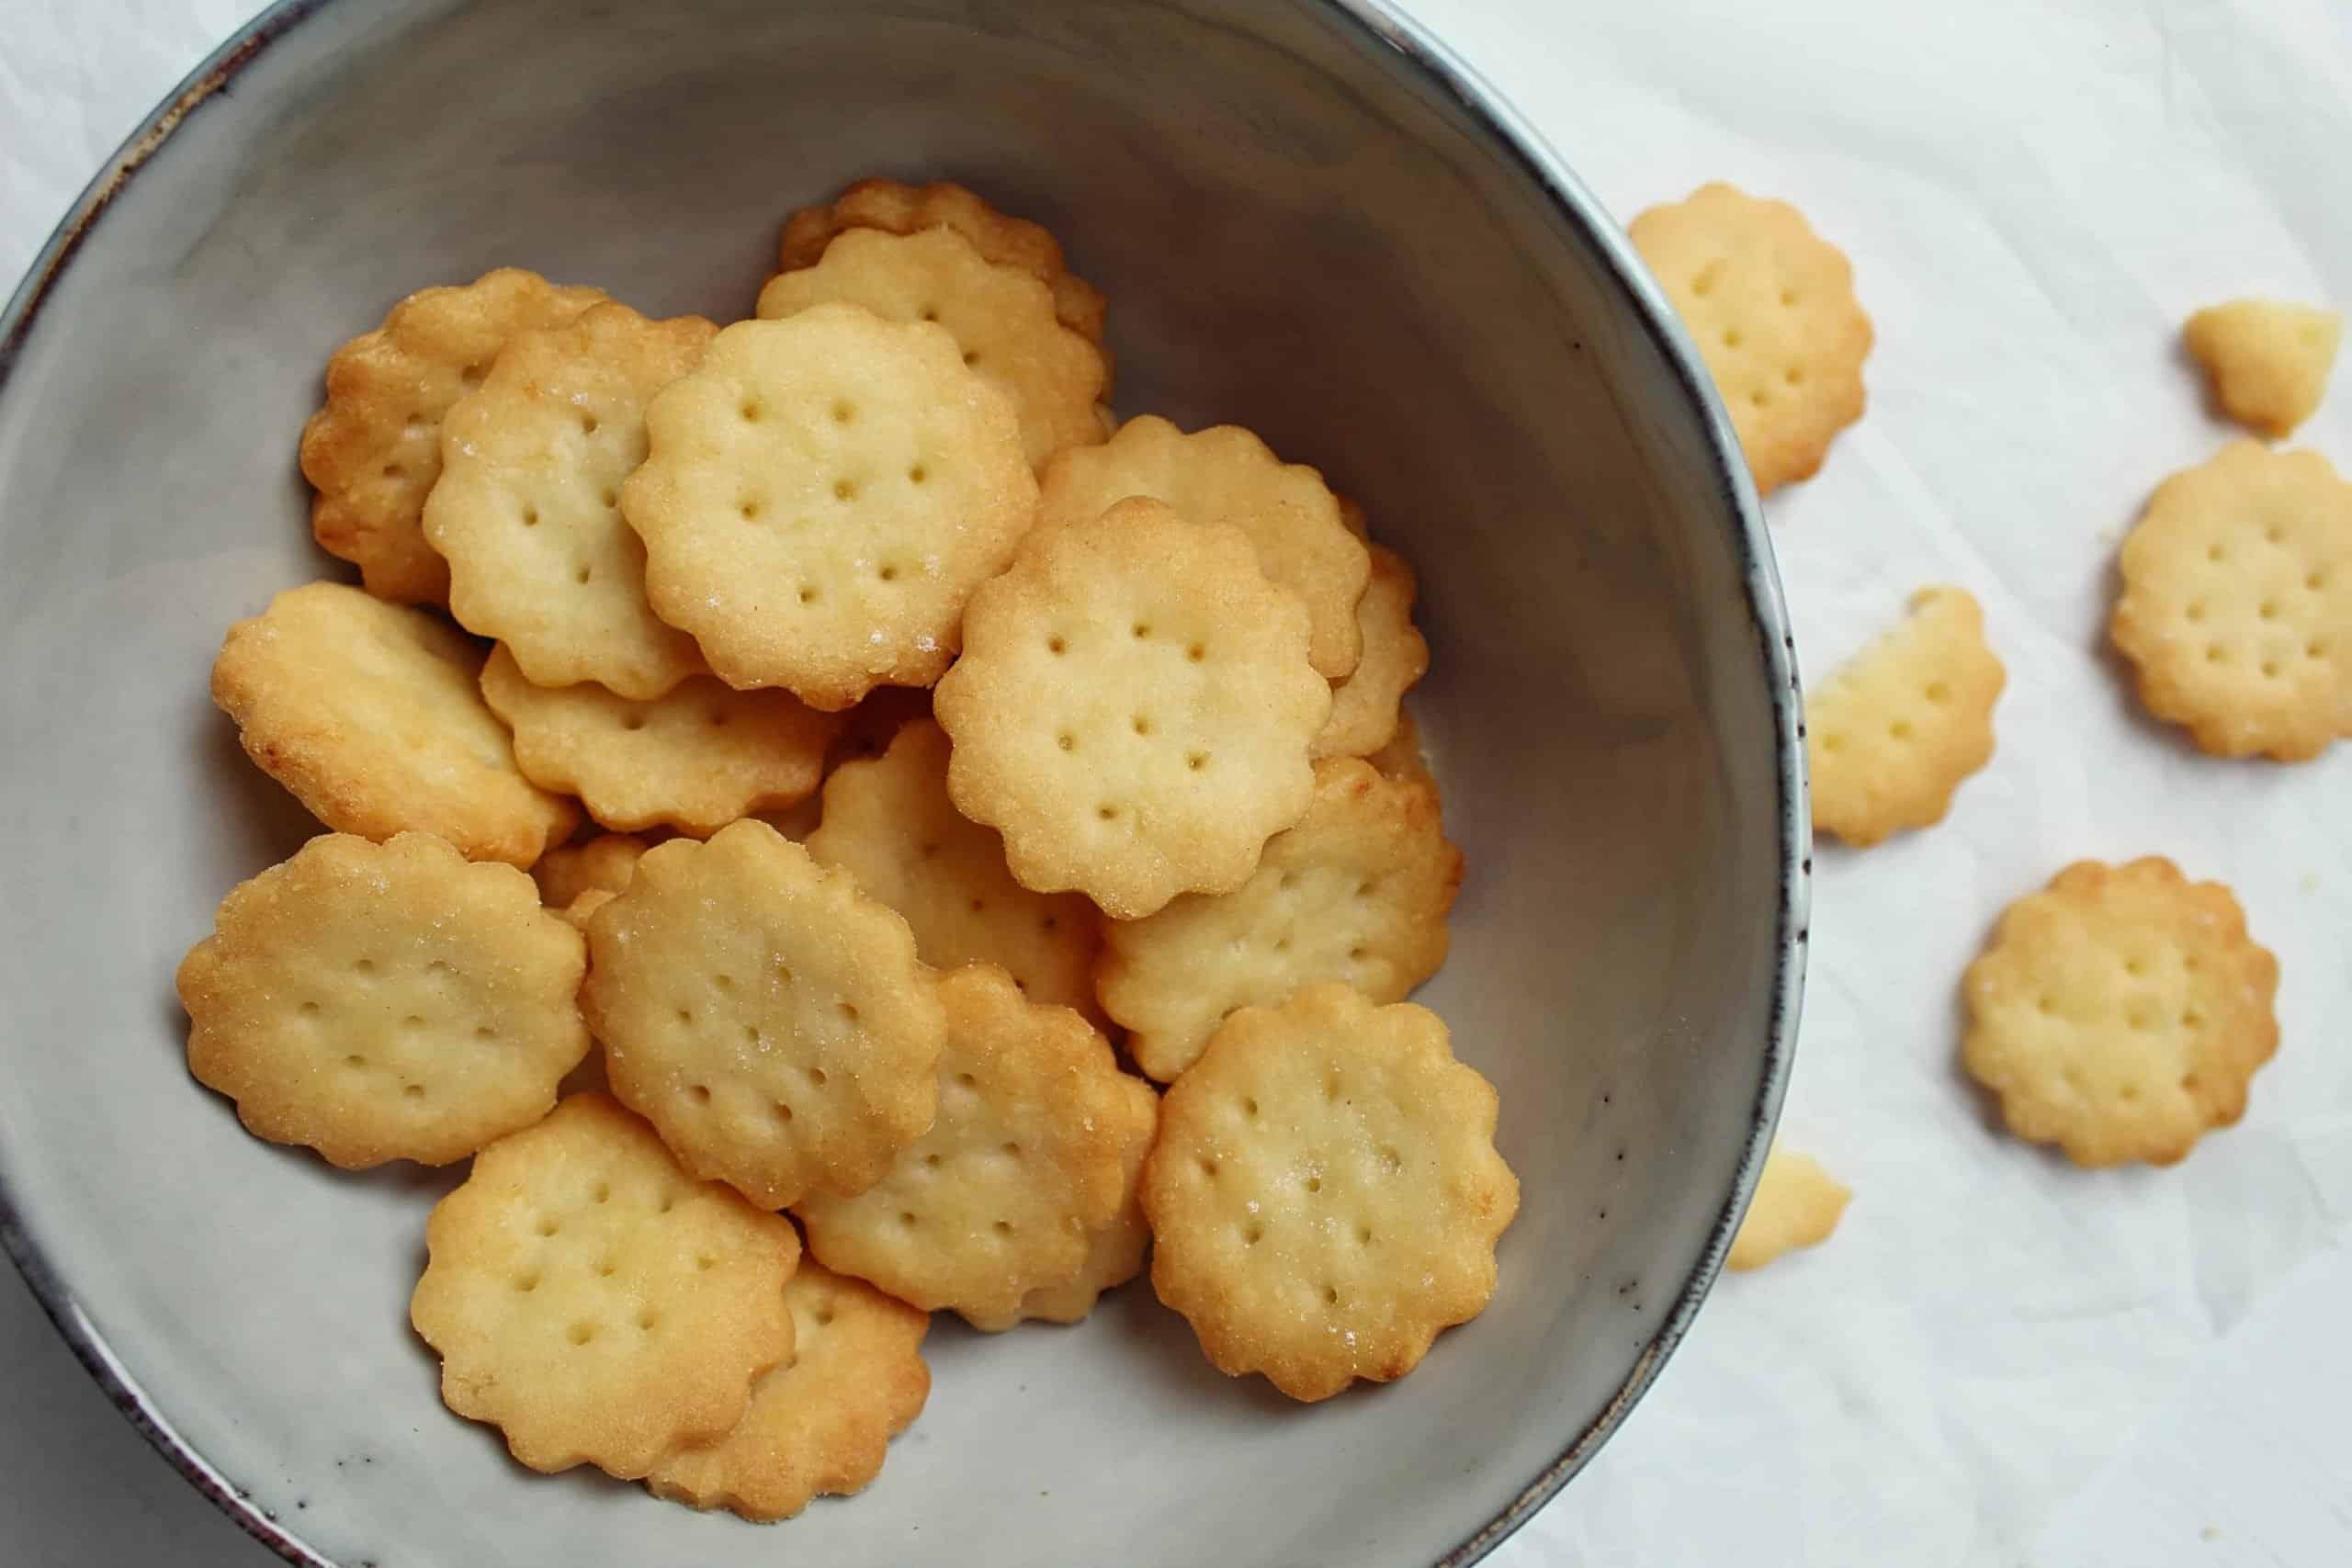 GLUTEN FREE MINI CHEDDARS CHEESE RITZ CRACKER RECIPE 131